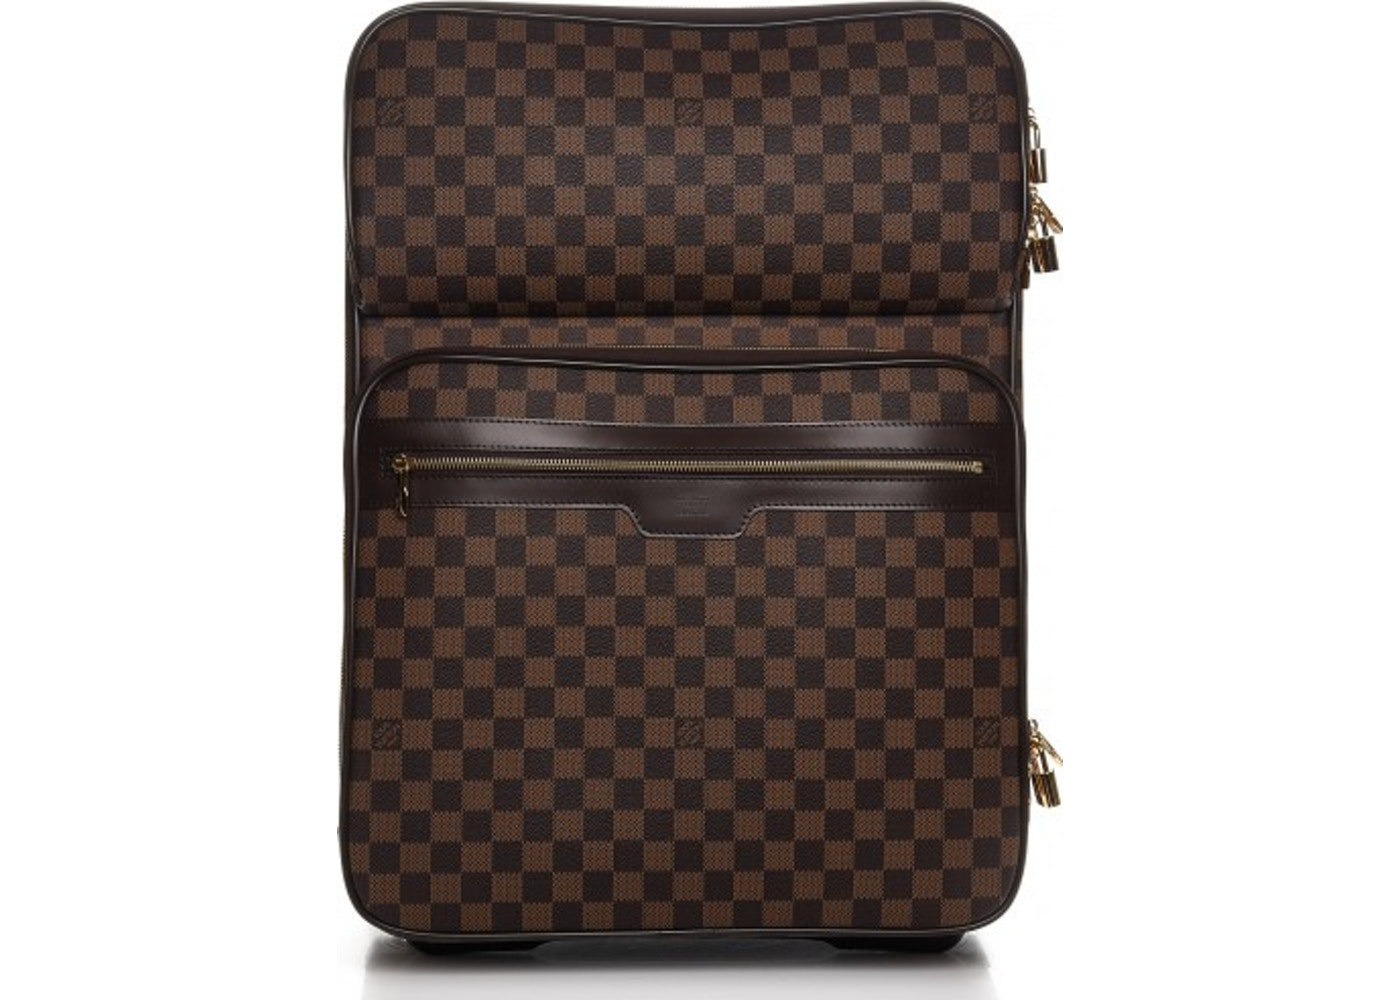 bb1d211619 Louis Vuitton Suitcase Pegase Business Damier Ebene 55 Brown. Damier Ebene  55 Brown